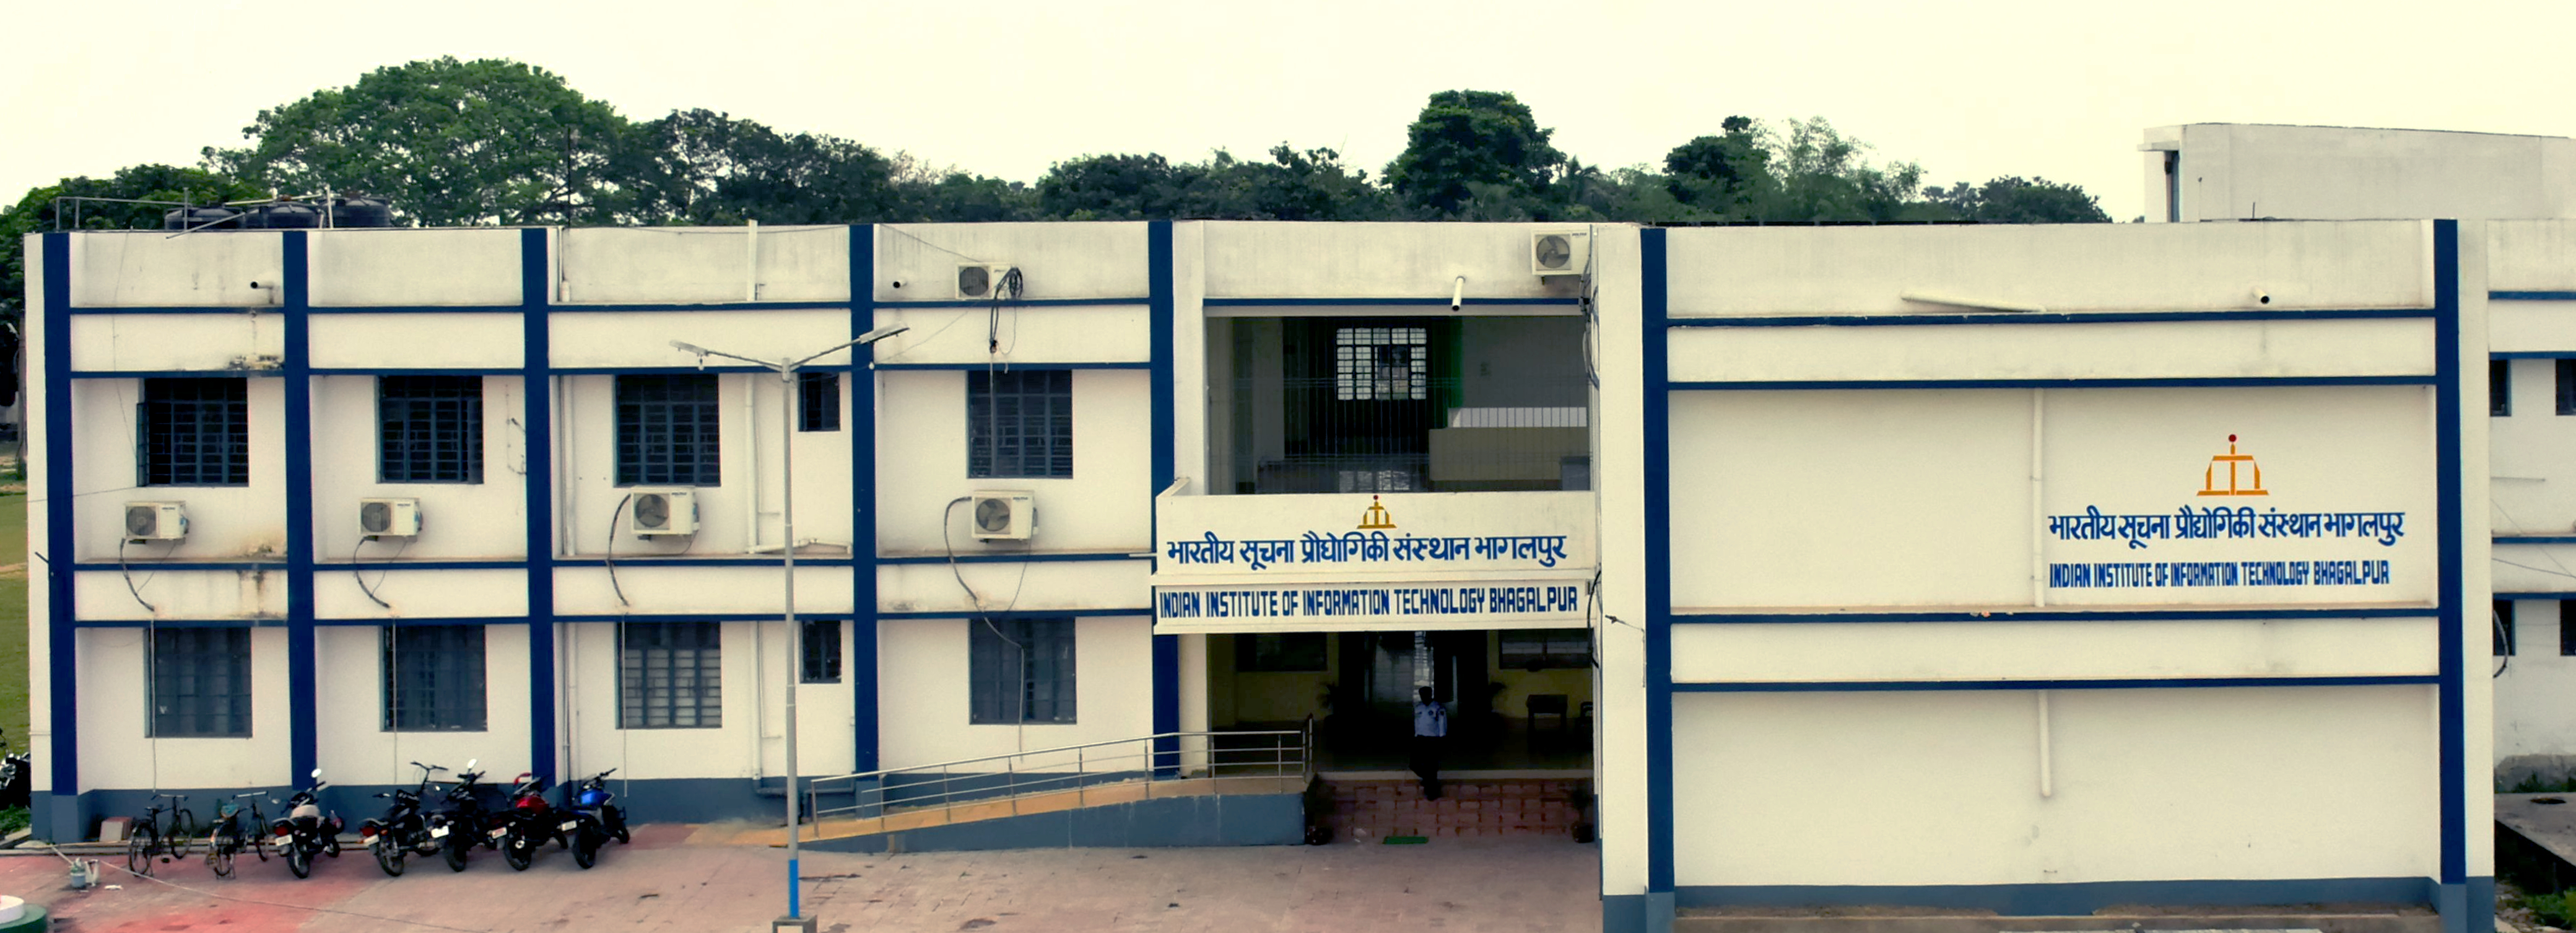 IIIT (Indian Institute of Information Technology), Bhagalpur Image